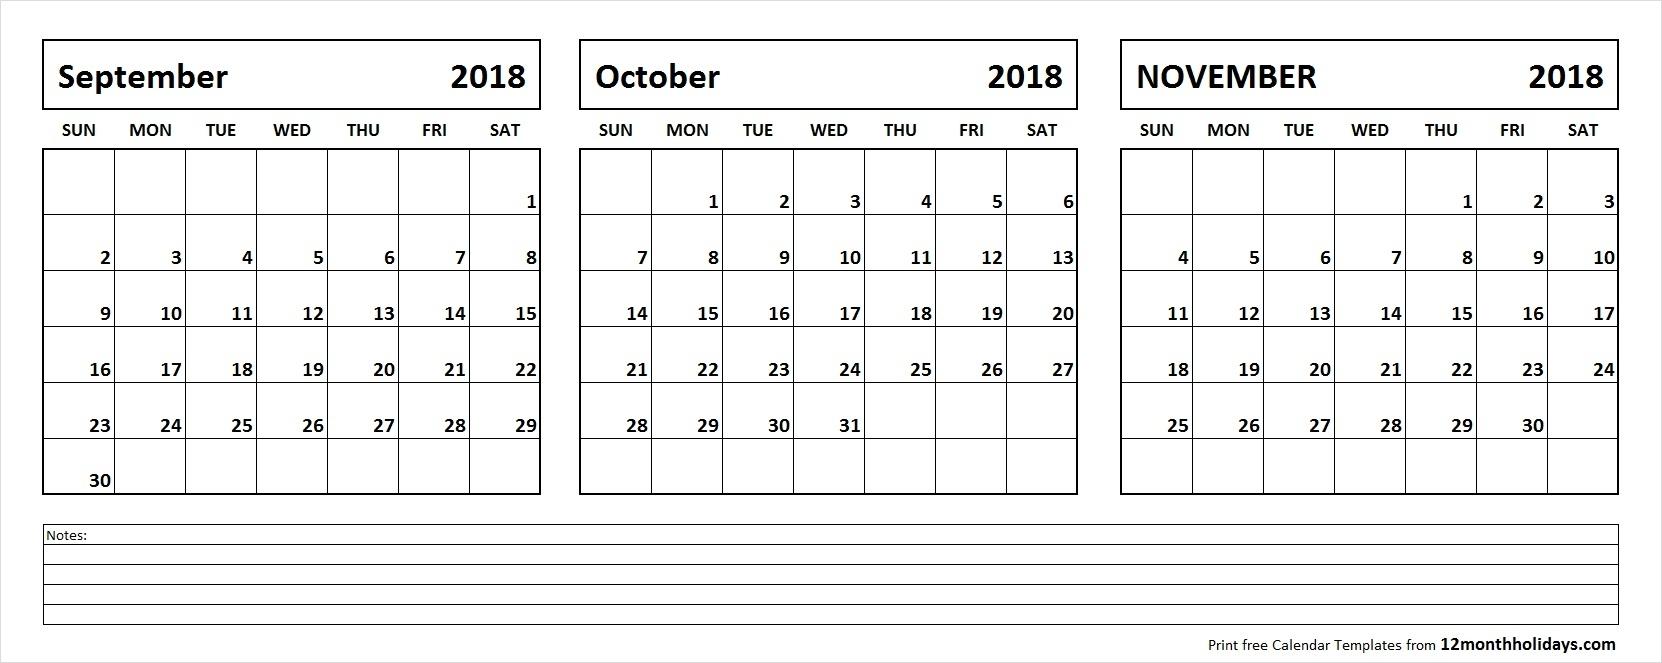 September October November 2018 Calendar Template | 3 Month Calendar for 3 Month Calendar Printable With Notes September October November